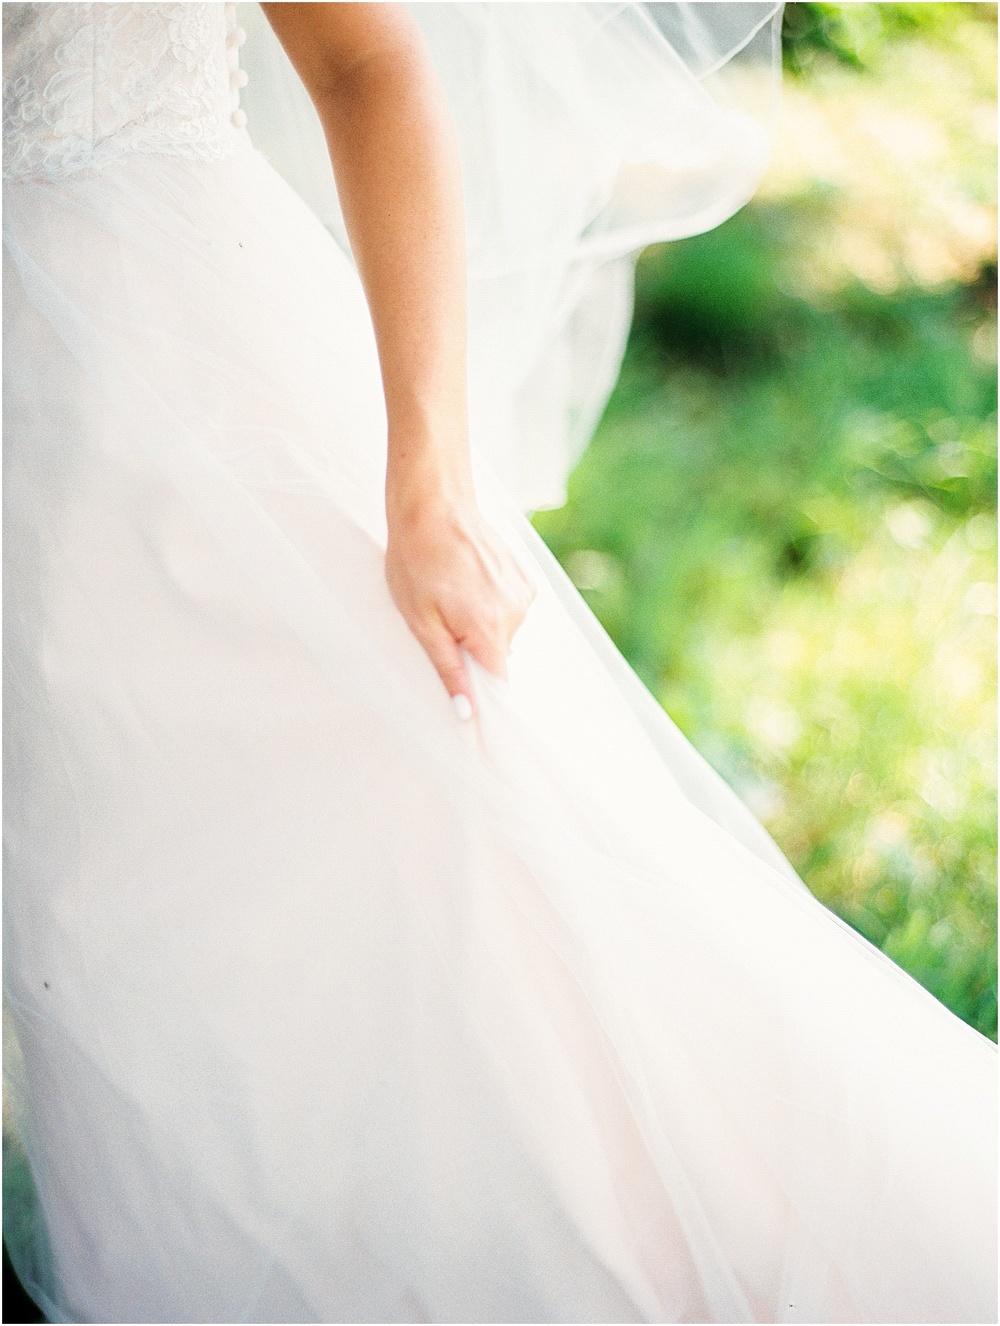 Frame by Frame - Dress in the wind - Jordan Brittley Photography (www.jordanbrittleyblog.com)